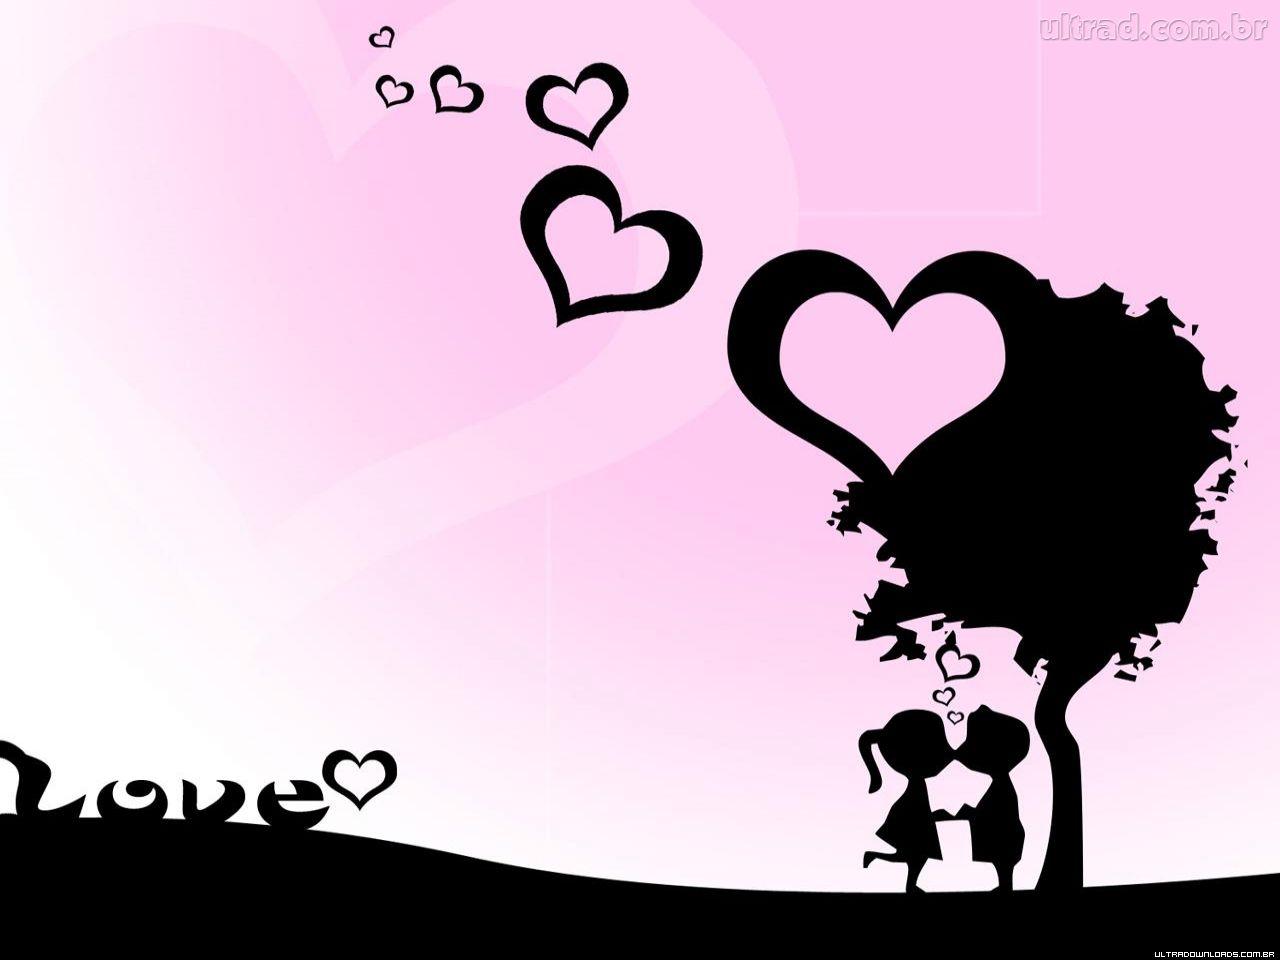 Imagenes De Amor.Com Gratis - IMAGENES BONITAS PARA FACEBOOK GRATIS